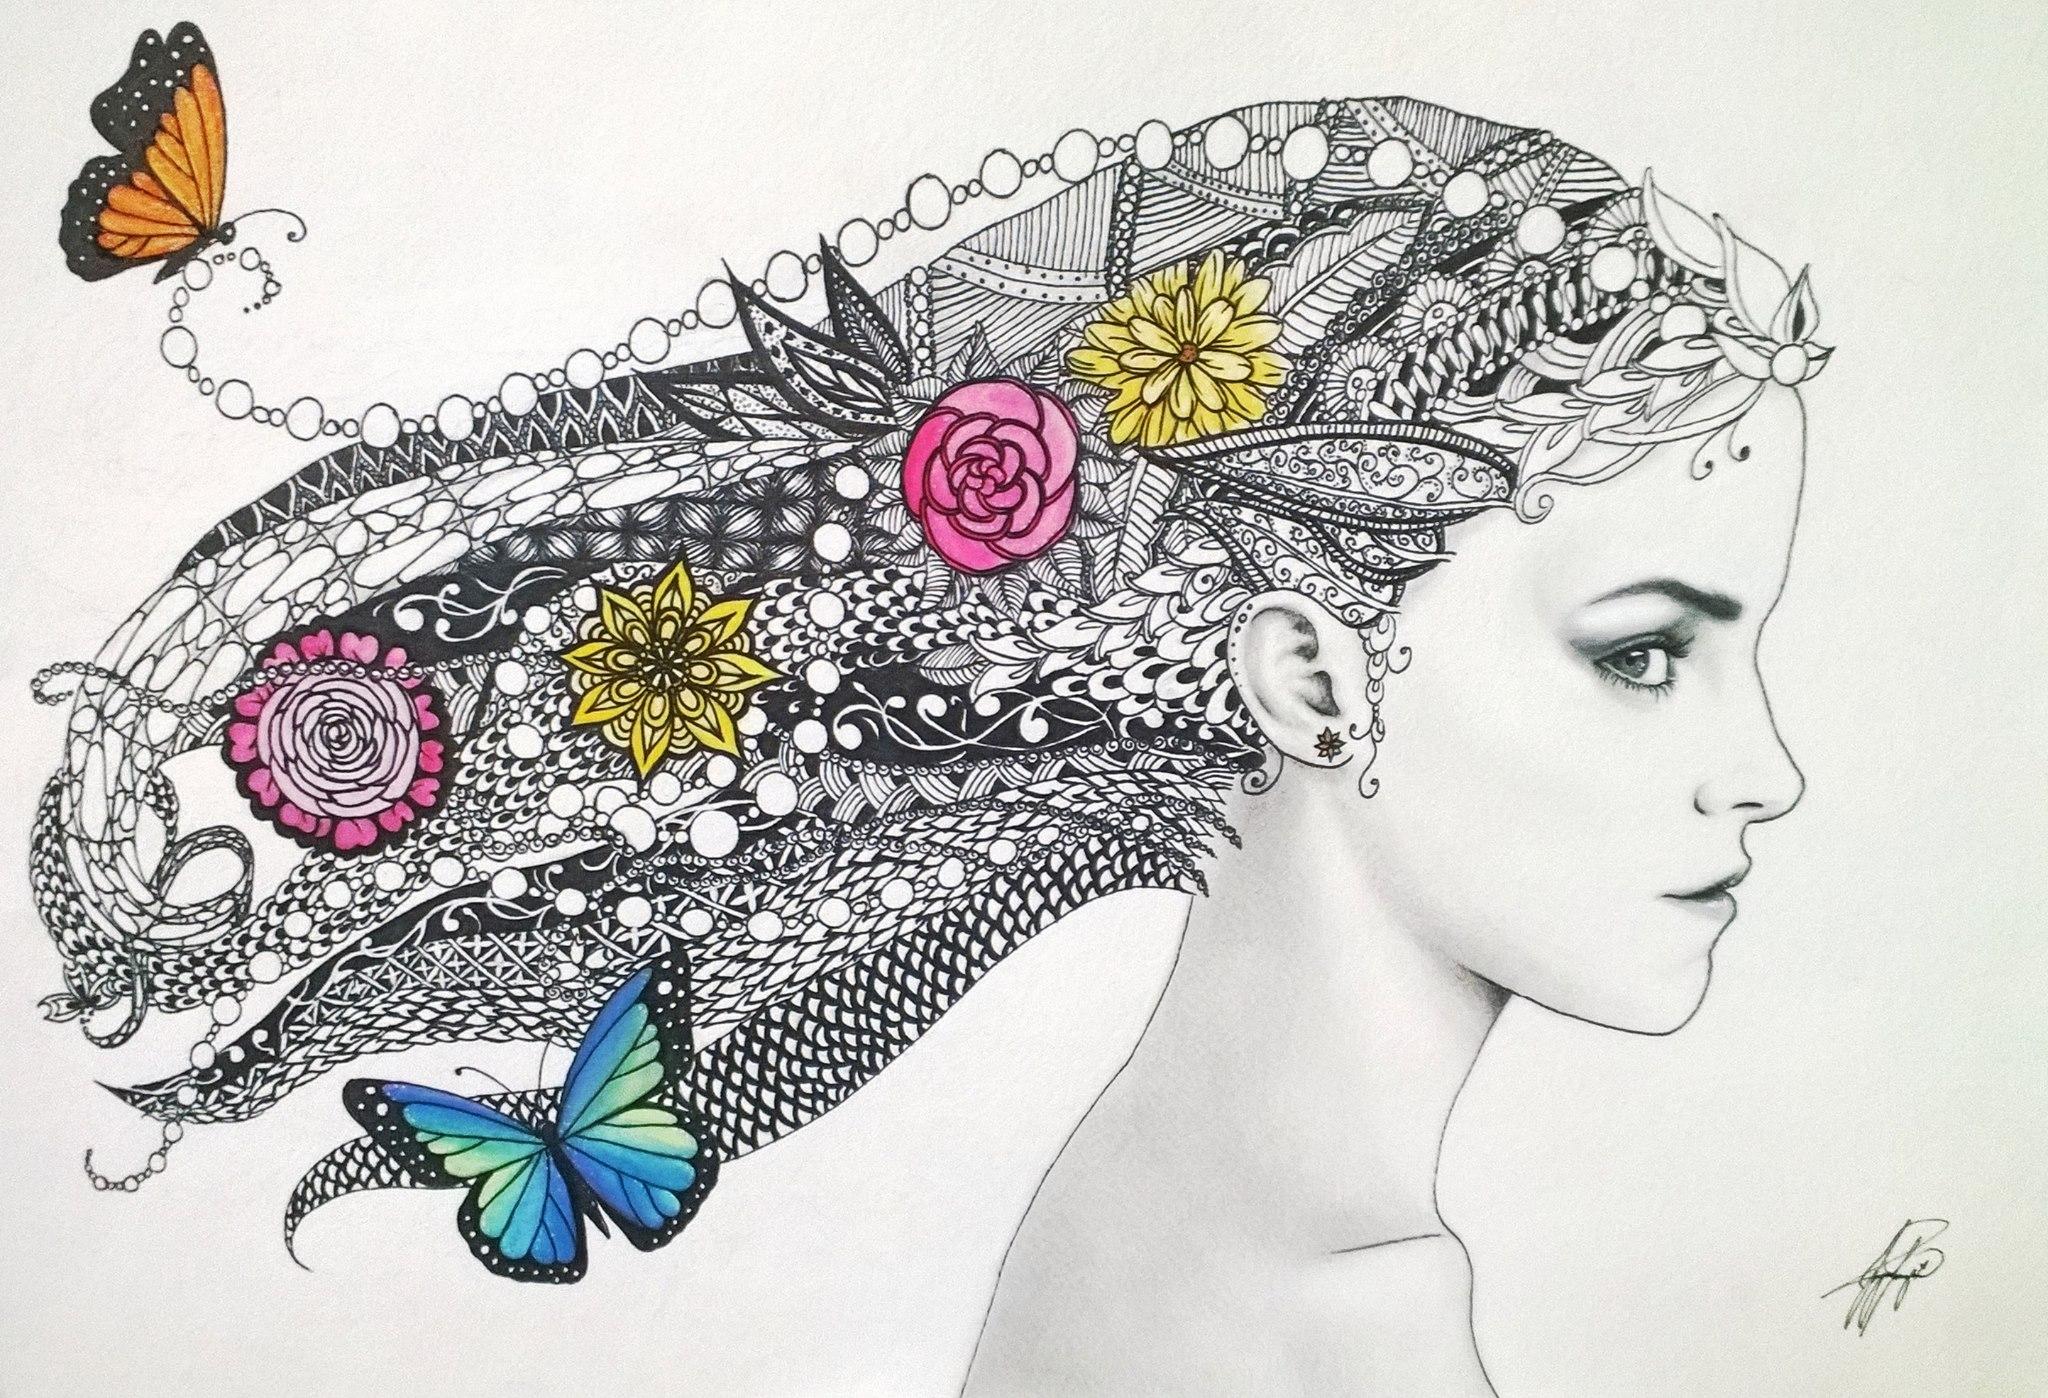 Zentangle Art By Imeganruby On Deviantart